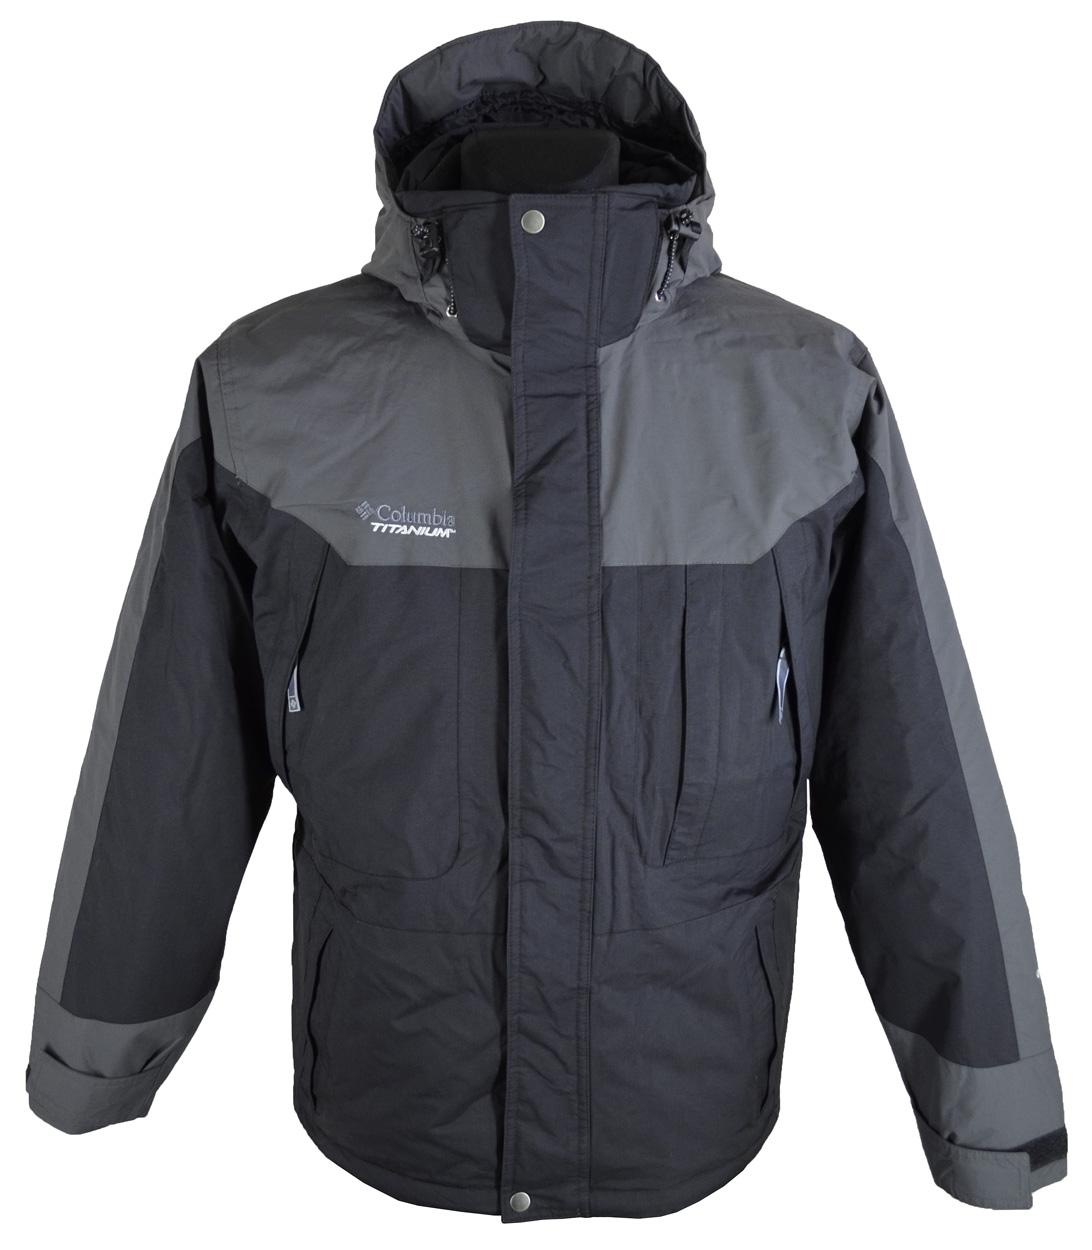 f0ac5be2fb853 Columbia Киев - мужские куртки, пуховики Columbia Omni Heat купить в ...